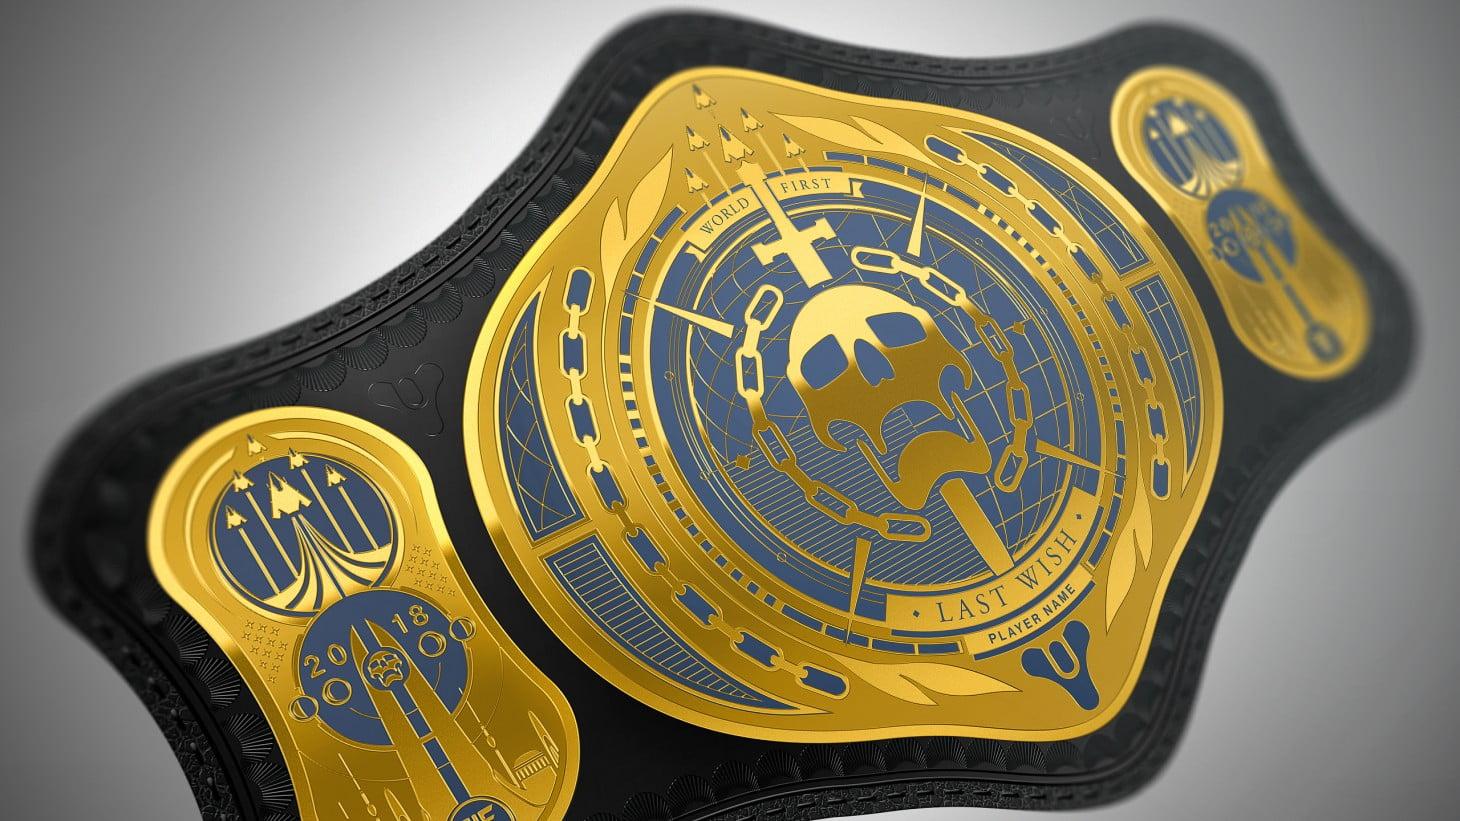 Destiny 2 Championship Wrestling Belt